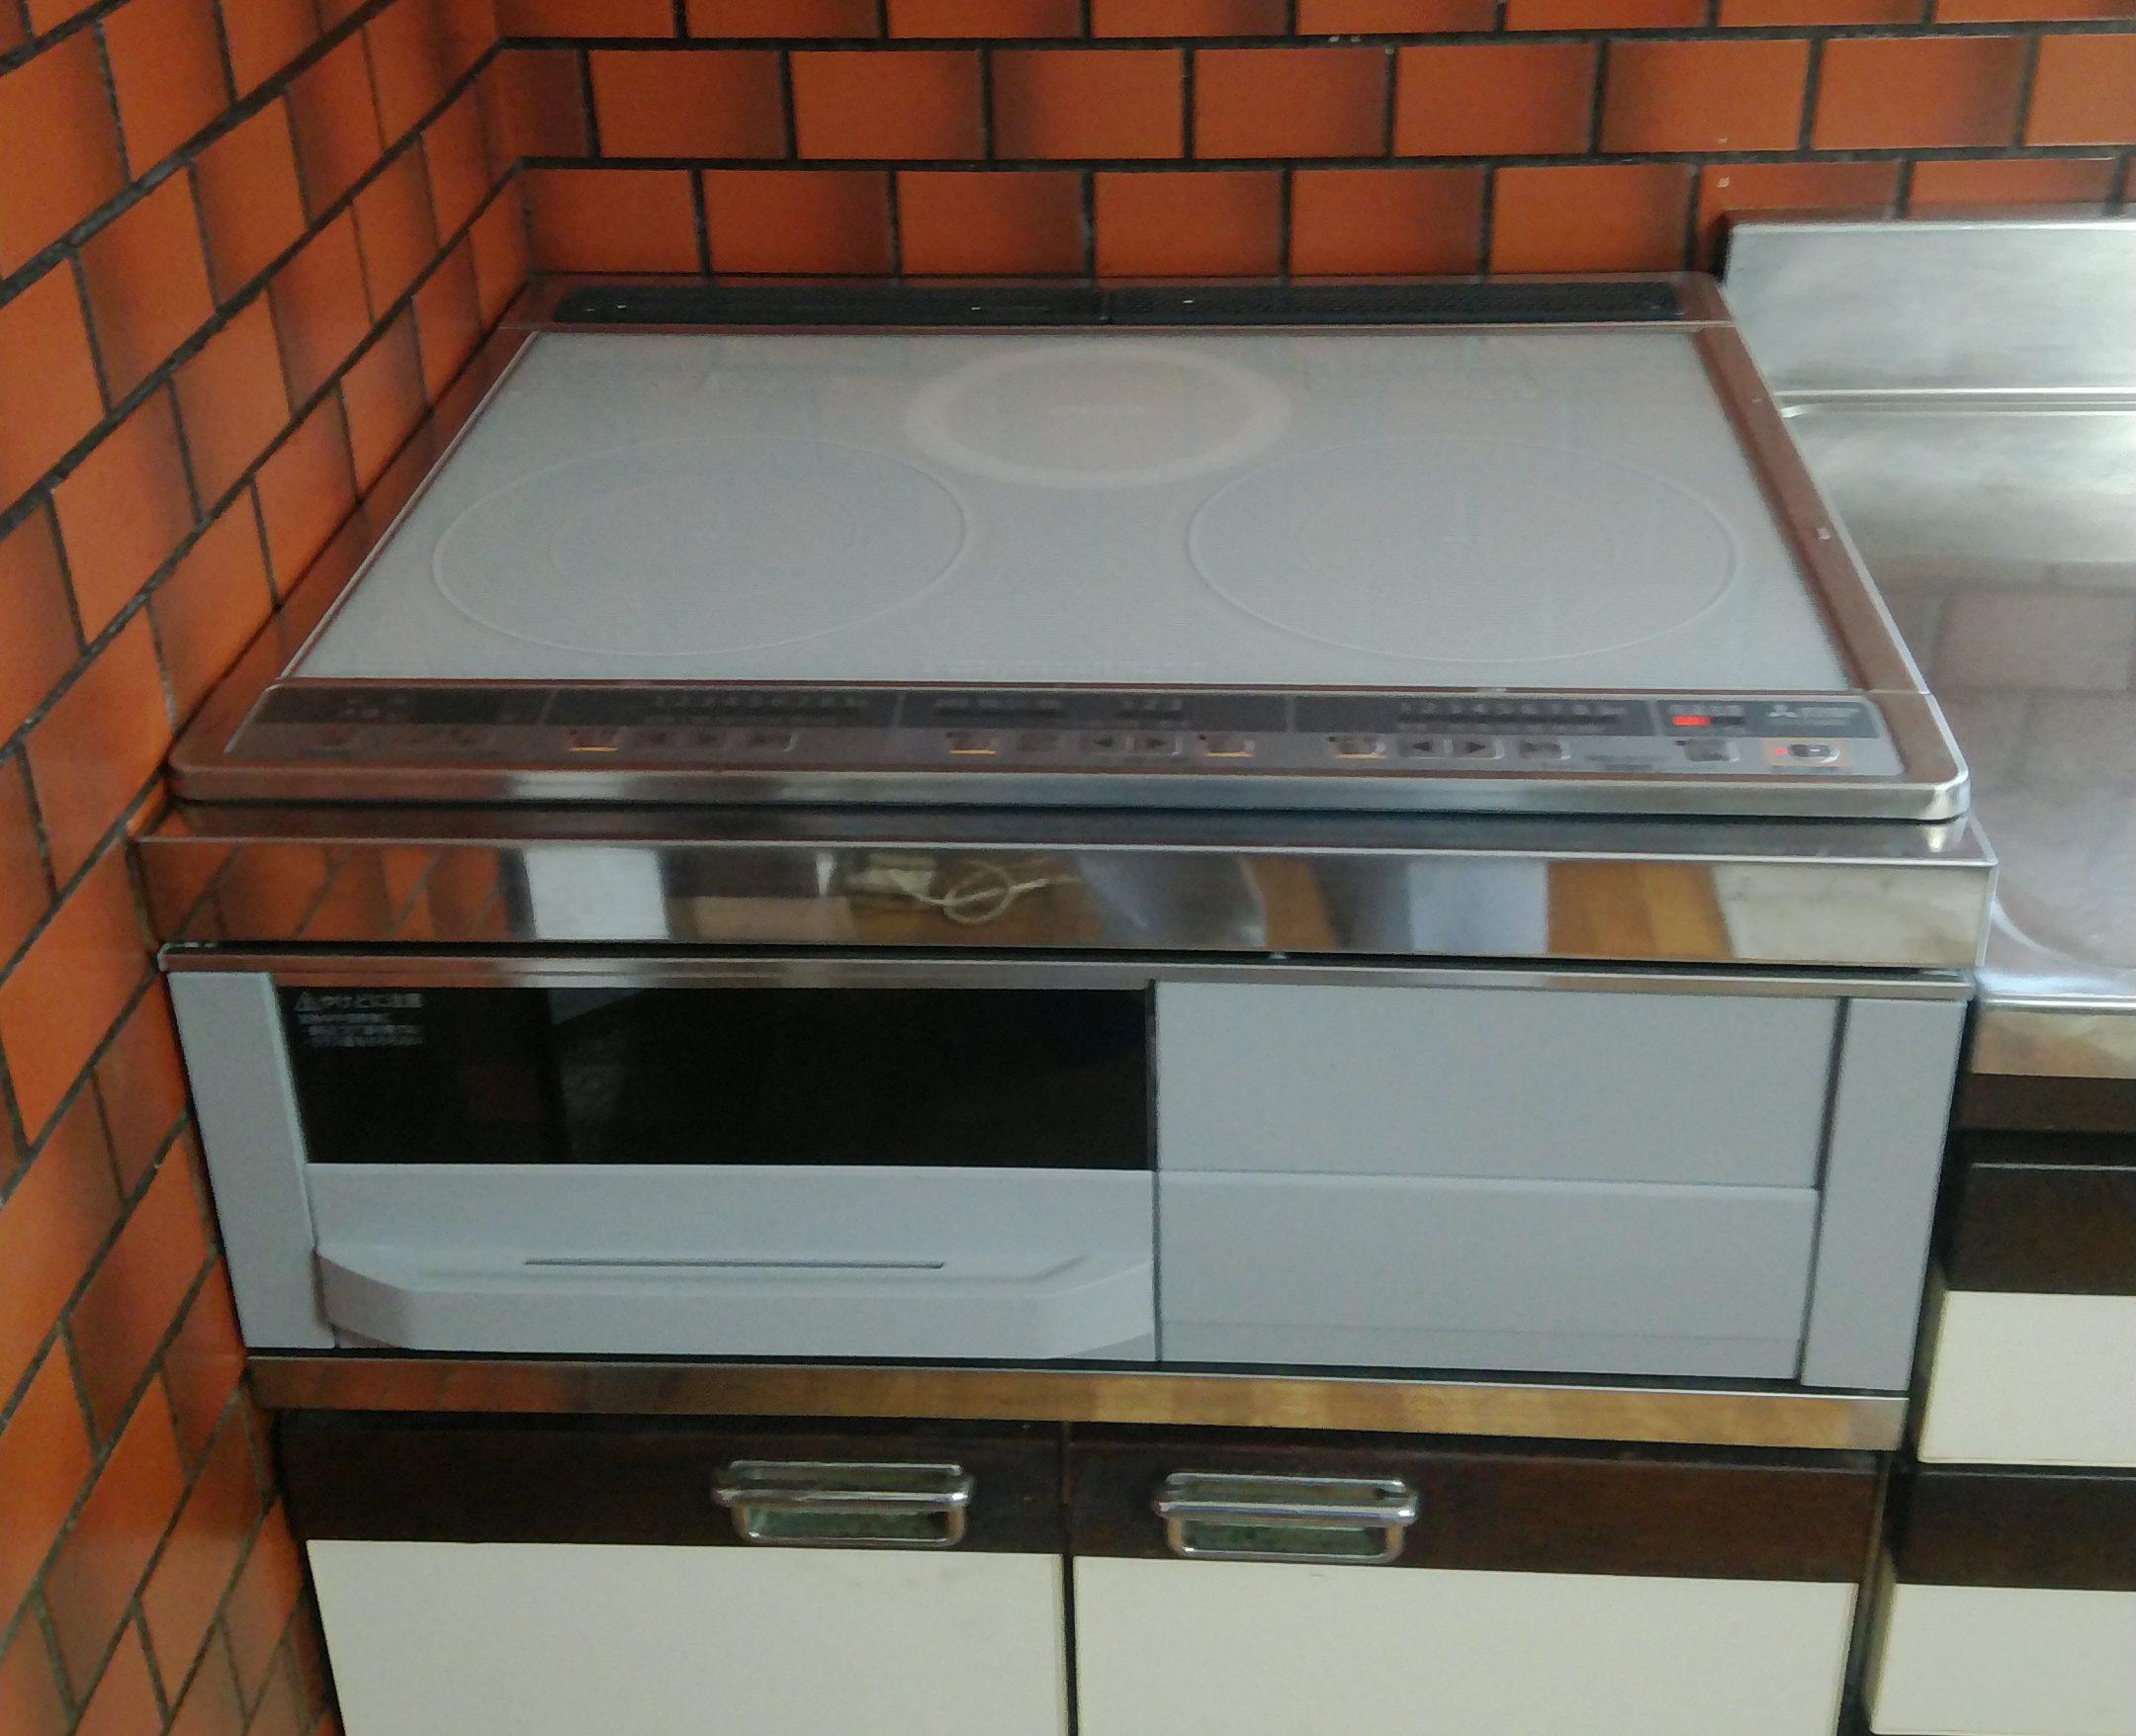 IHクッキングヒーター交換工事 名古屋市